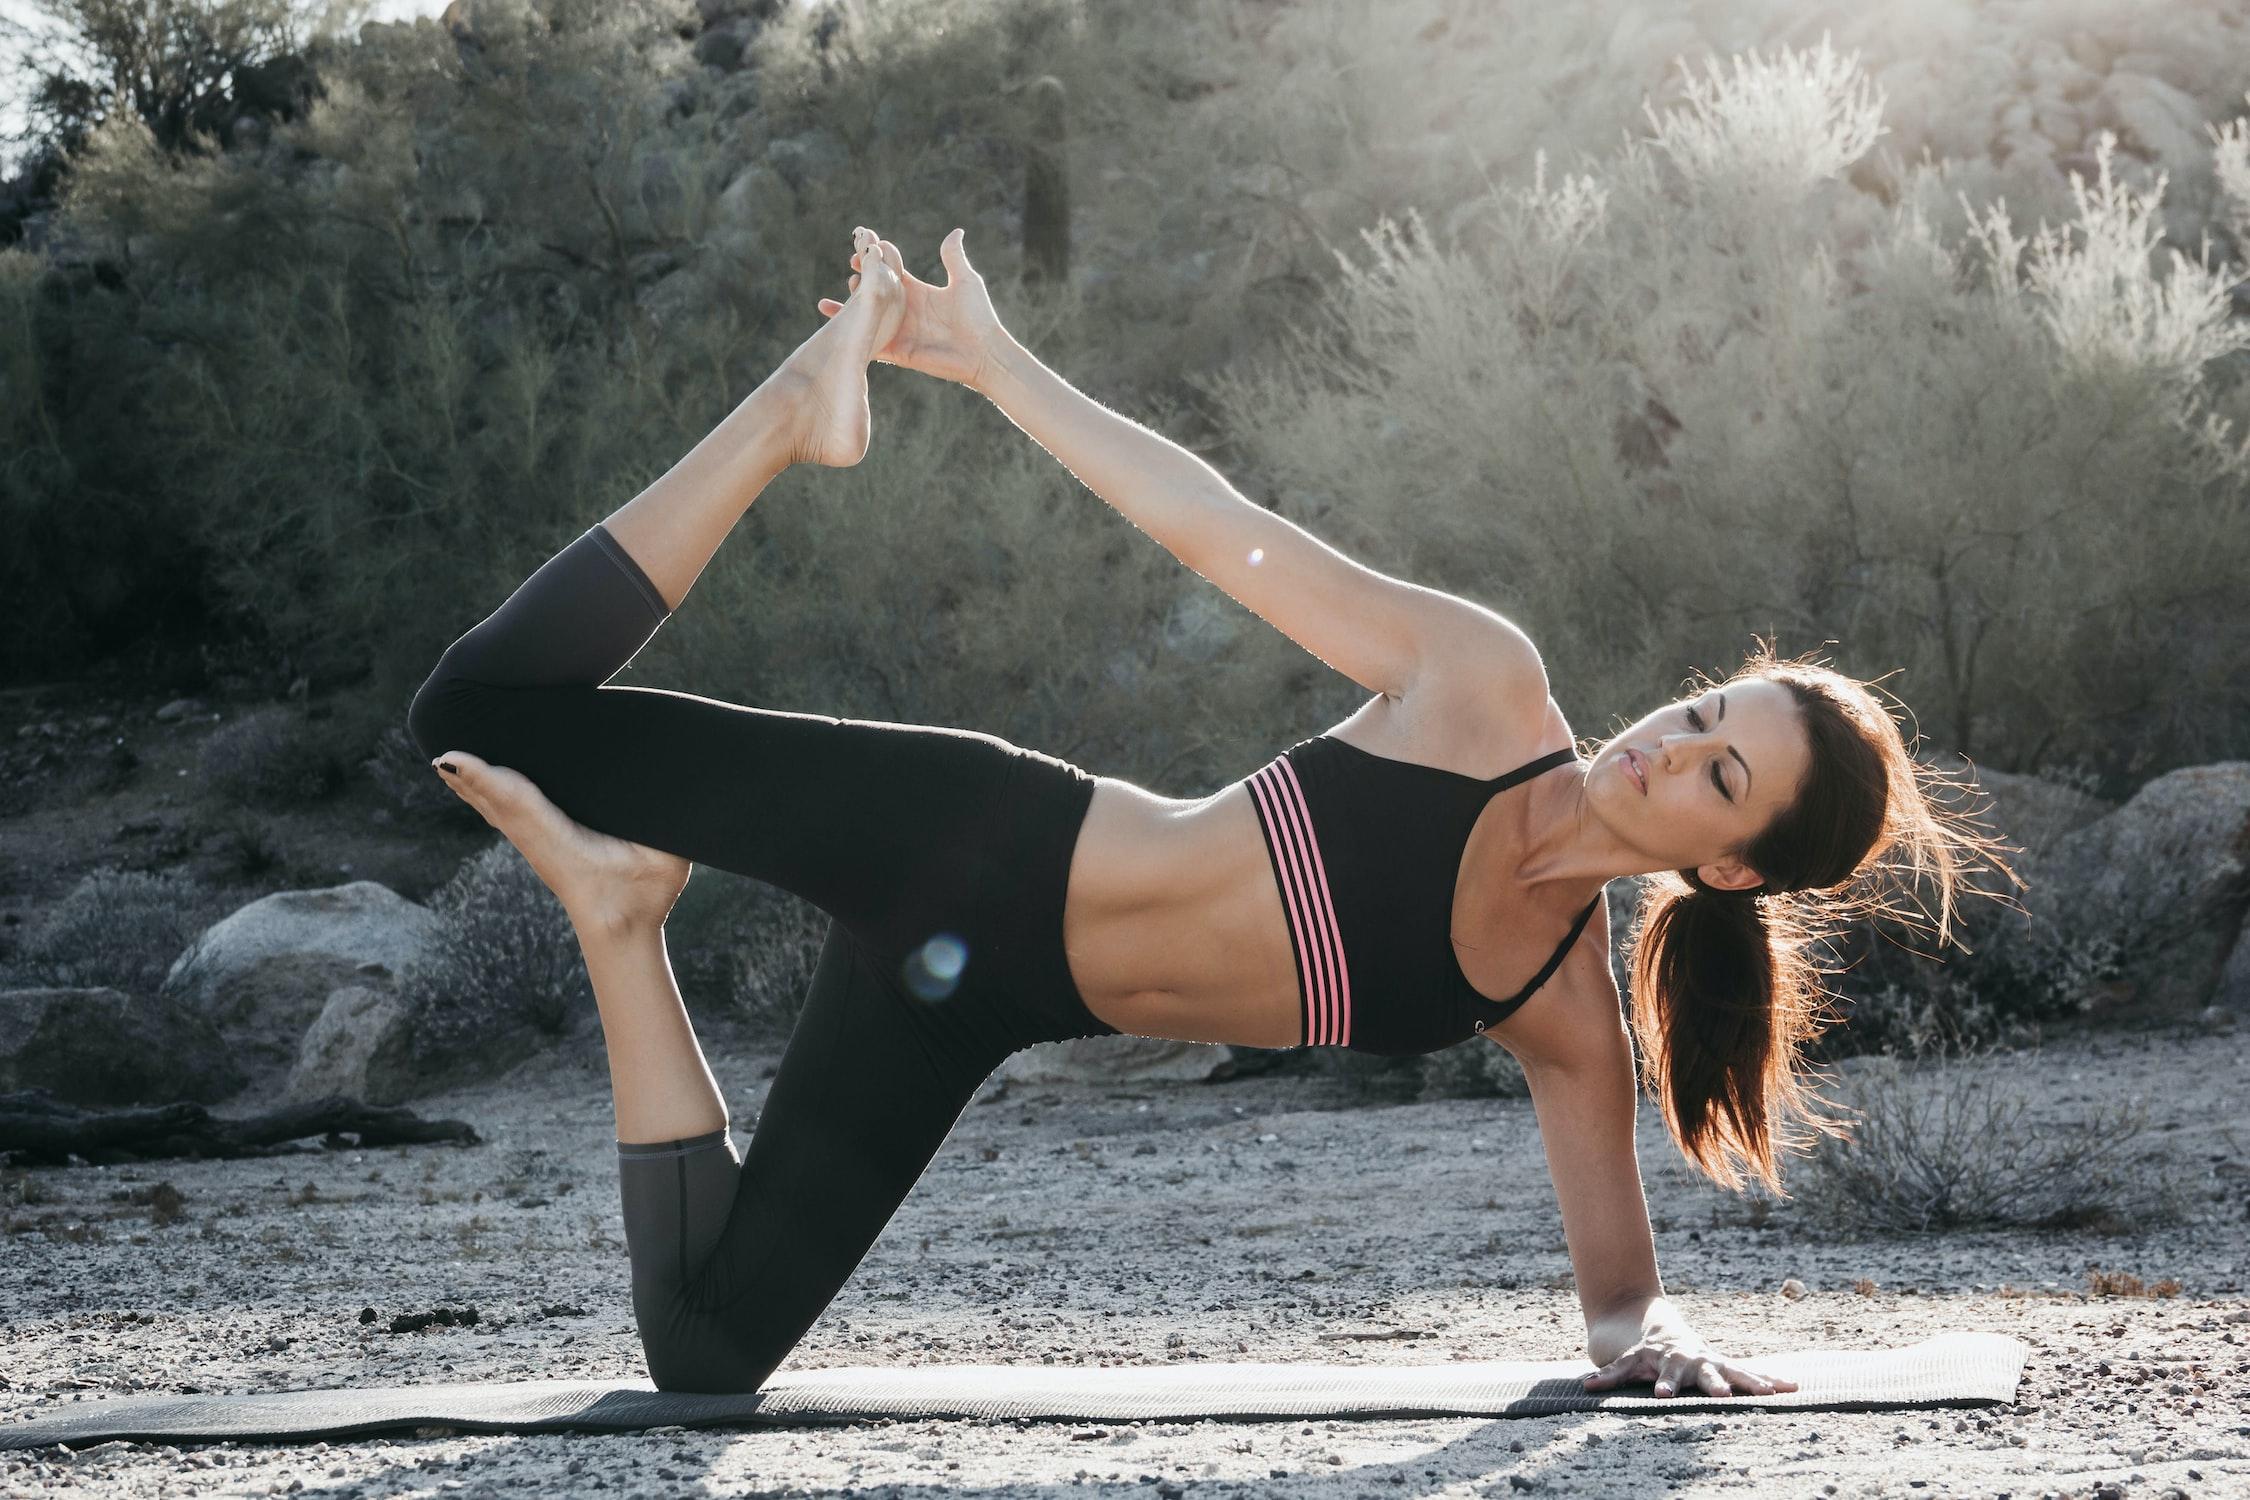 Practicing Yoga - woman in desert